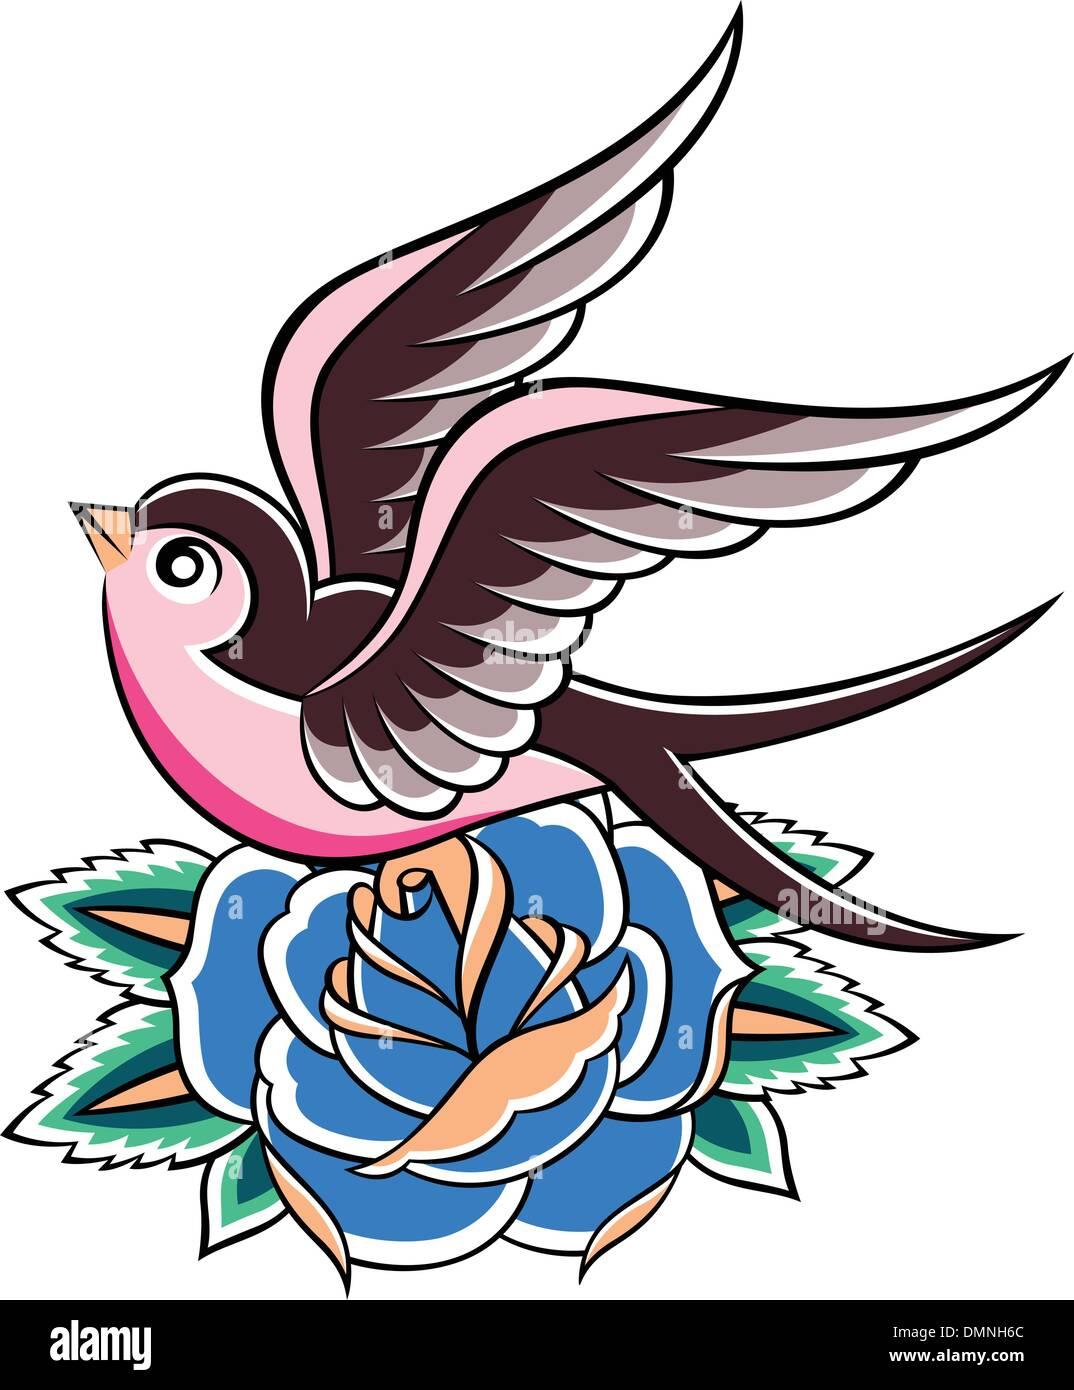 tattoo rose and bird stockfotos tattoo rose and bird bilder alamy. Black Bedroom Furniture Sets. Home Design Ideas